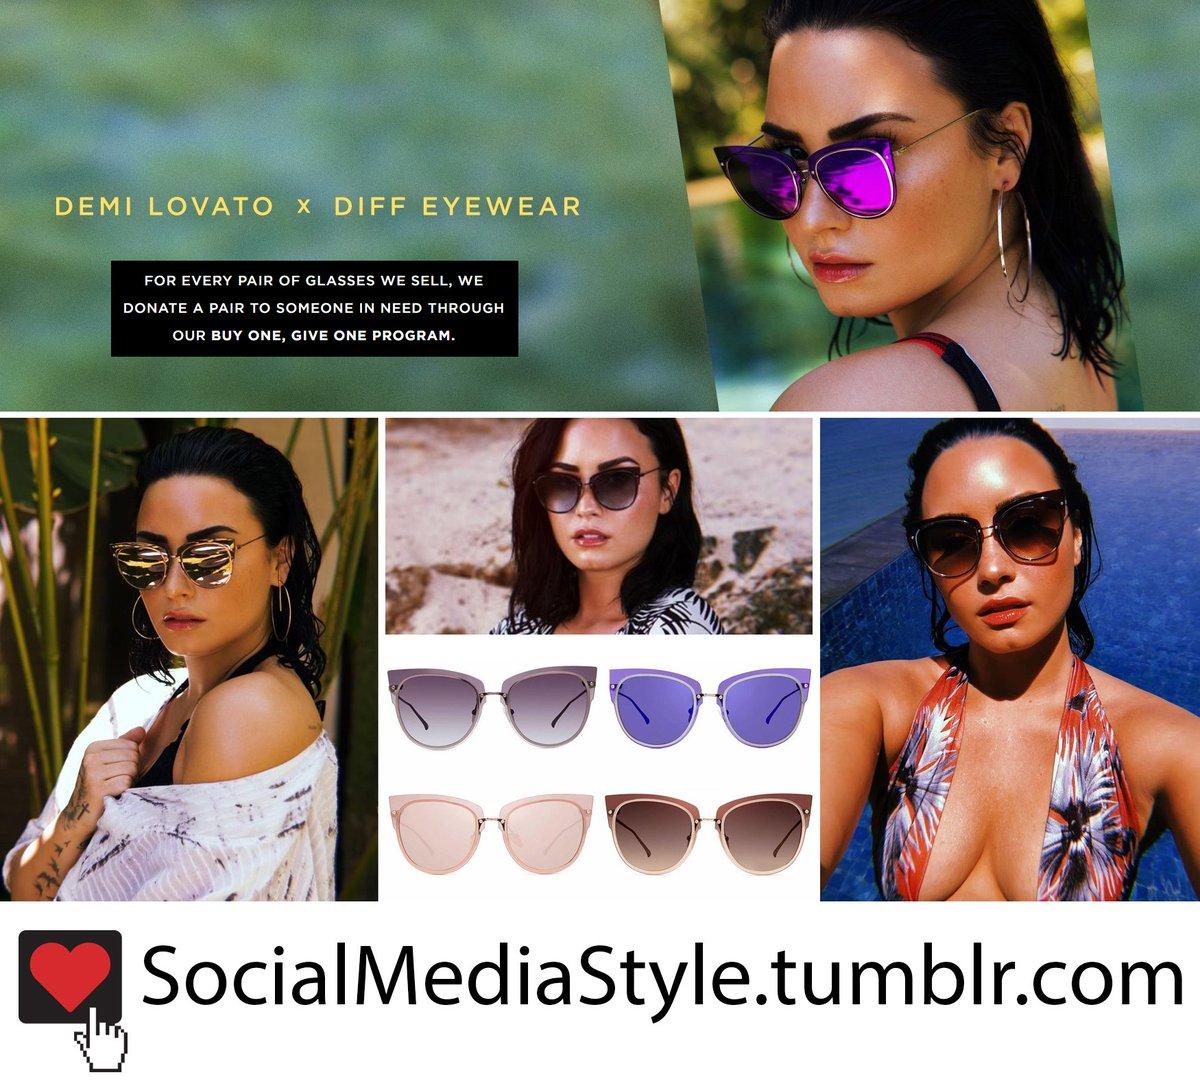 4f8d8b406a Buy them here  http   socialmediastyle.tumblr.com post 173781090415 demi- lovato-x-diff-eyewear-sunglasses …pic.twitter.com erU62rLudT